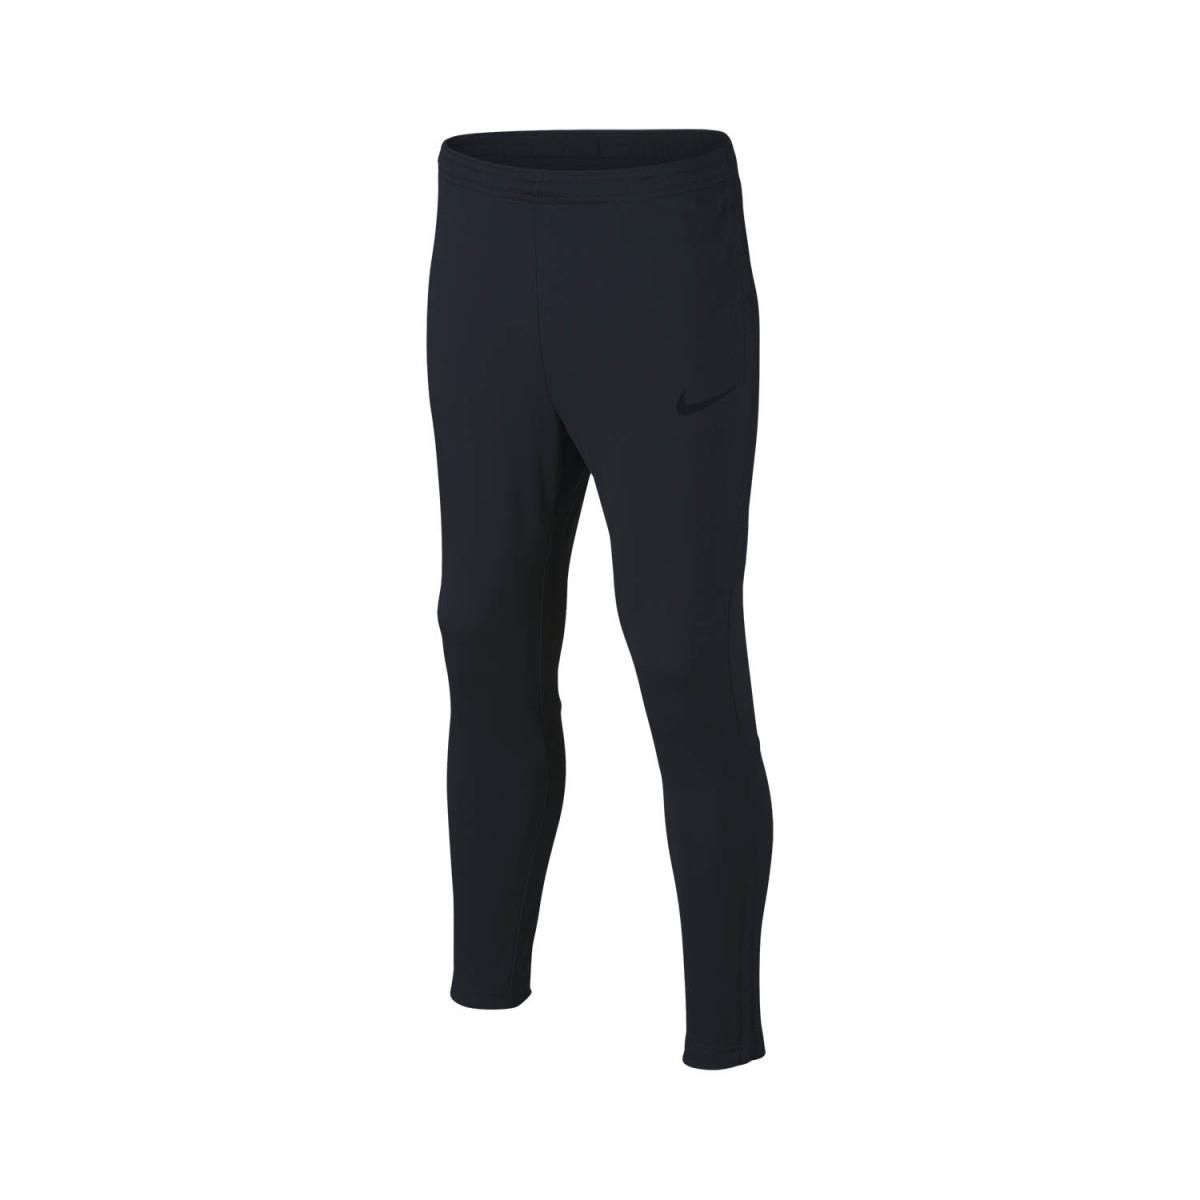 Pantalón Nike Dry Academy Kids - Nike - Marca 07a7ebc94a6a9